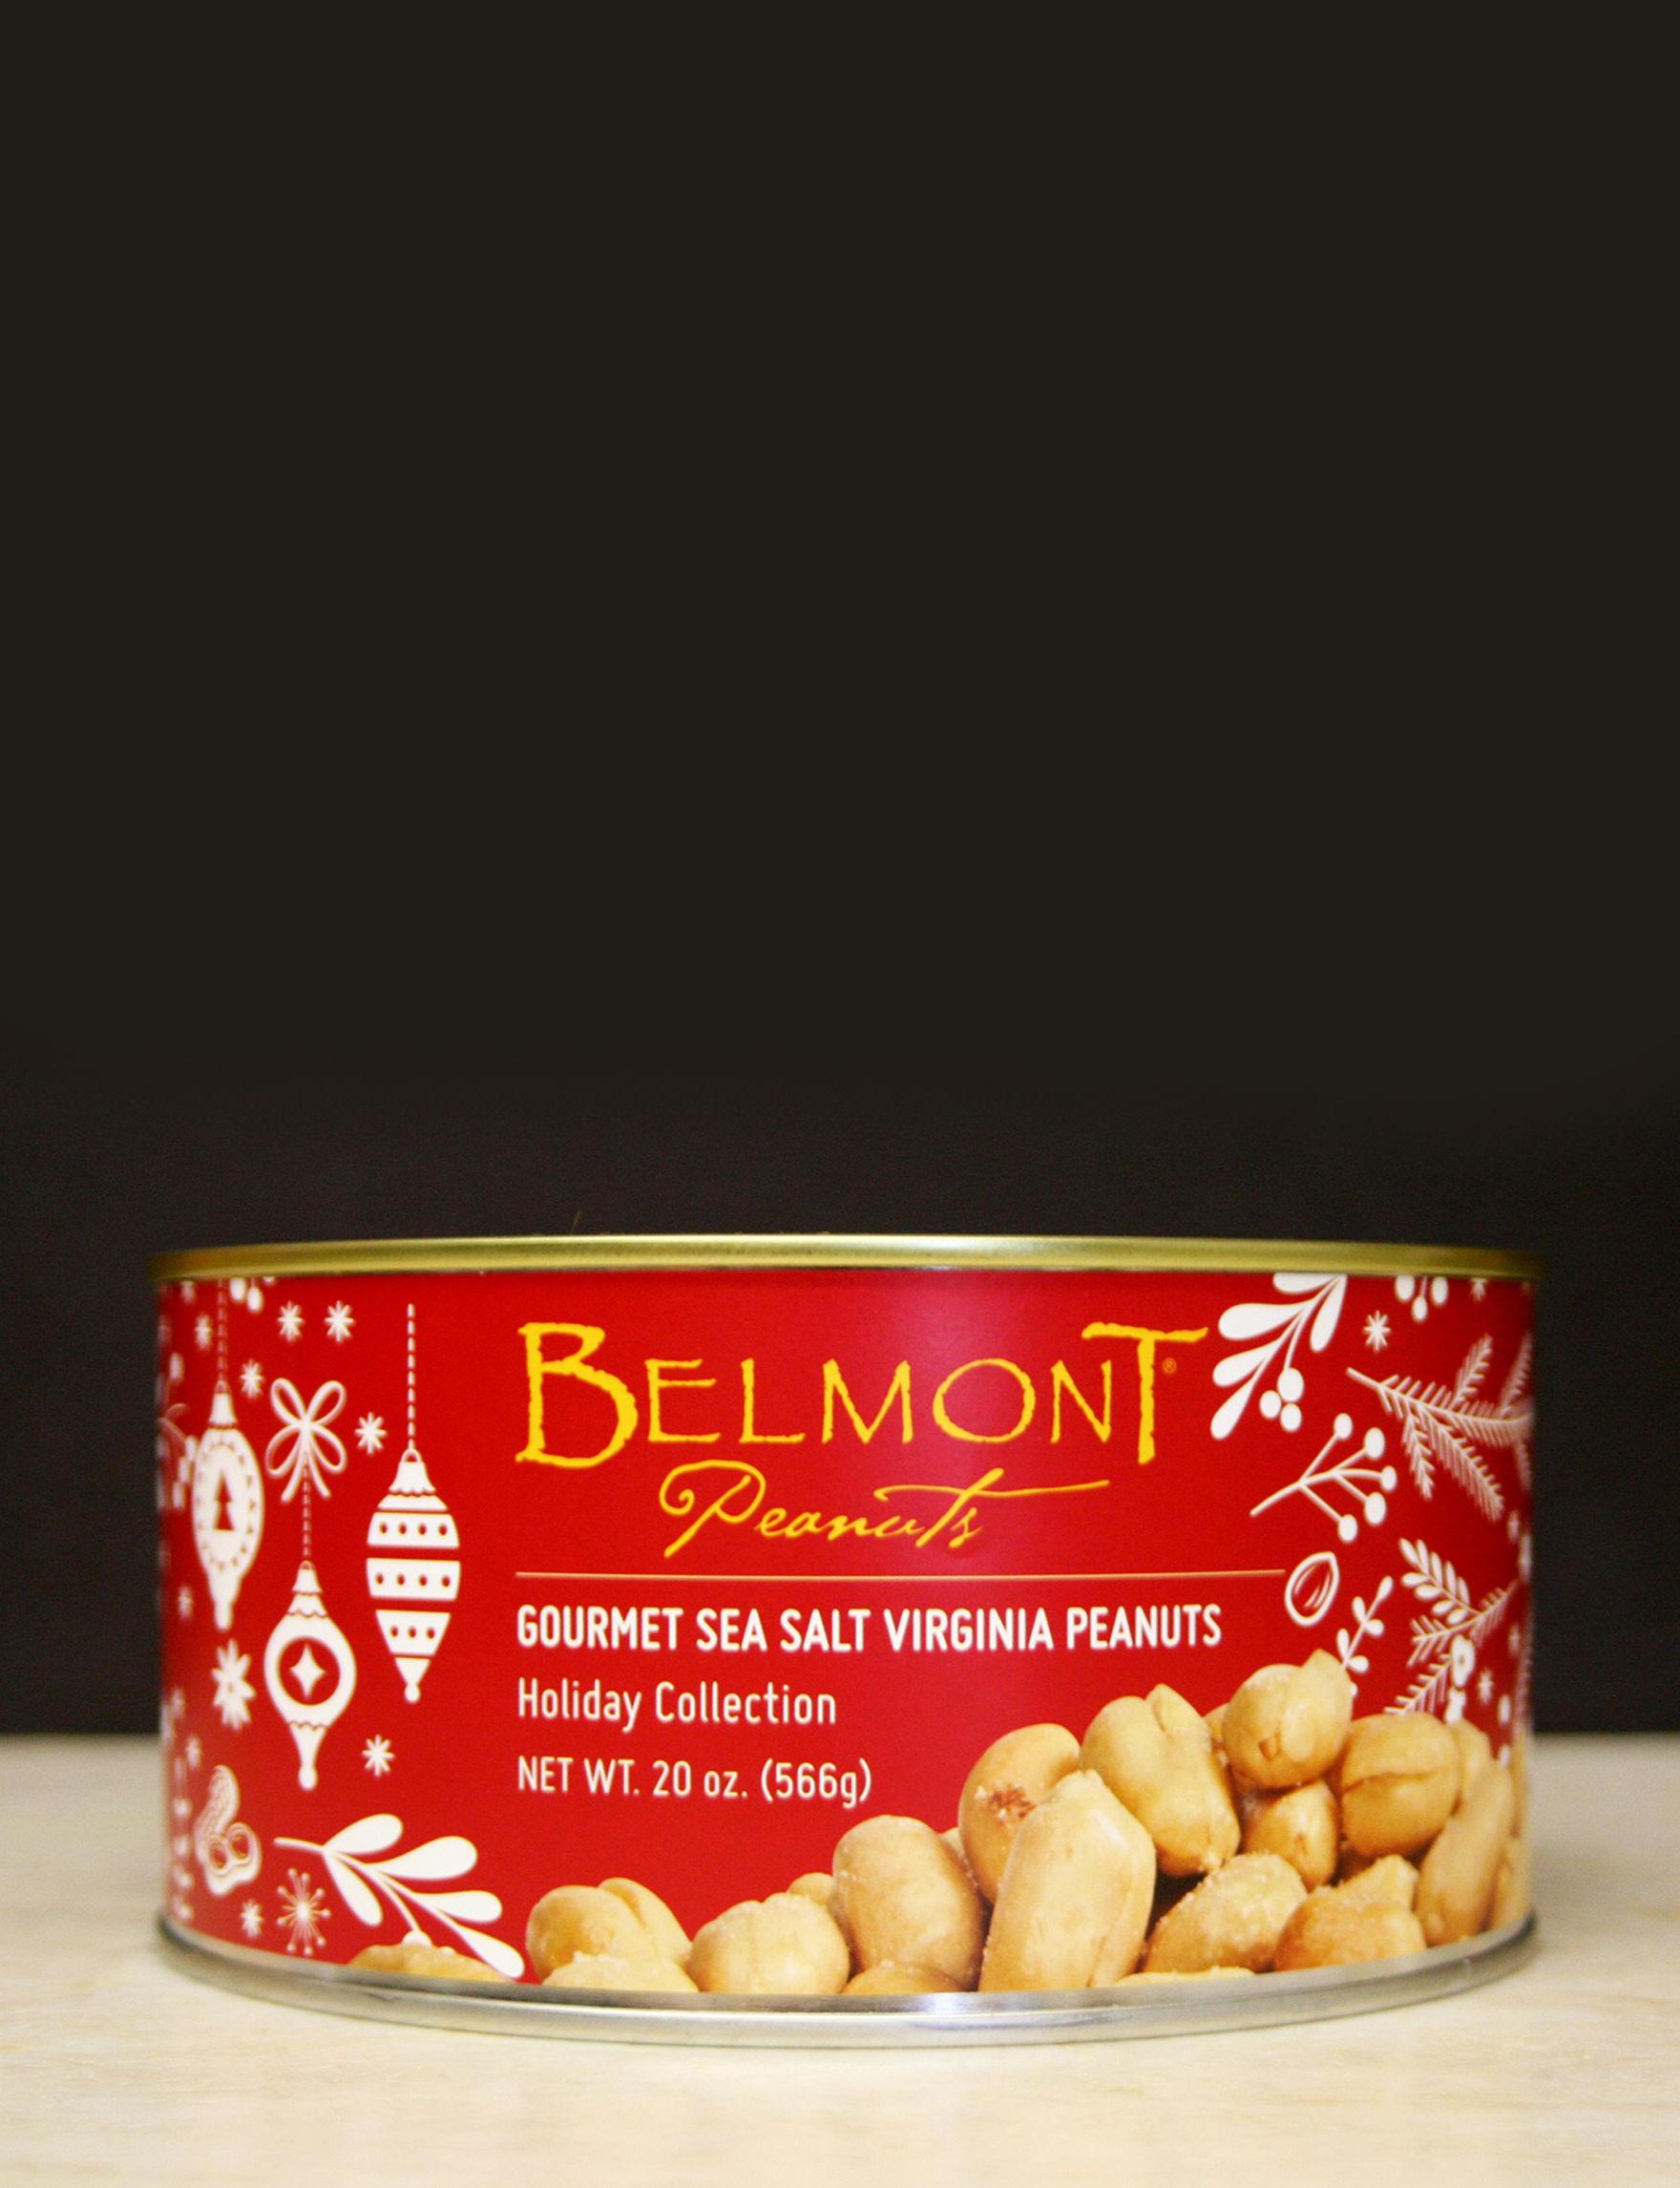 Belmont Peanuts Red Savory Treats Gourmet Food & Beverages